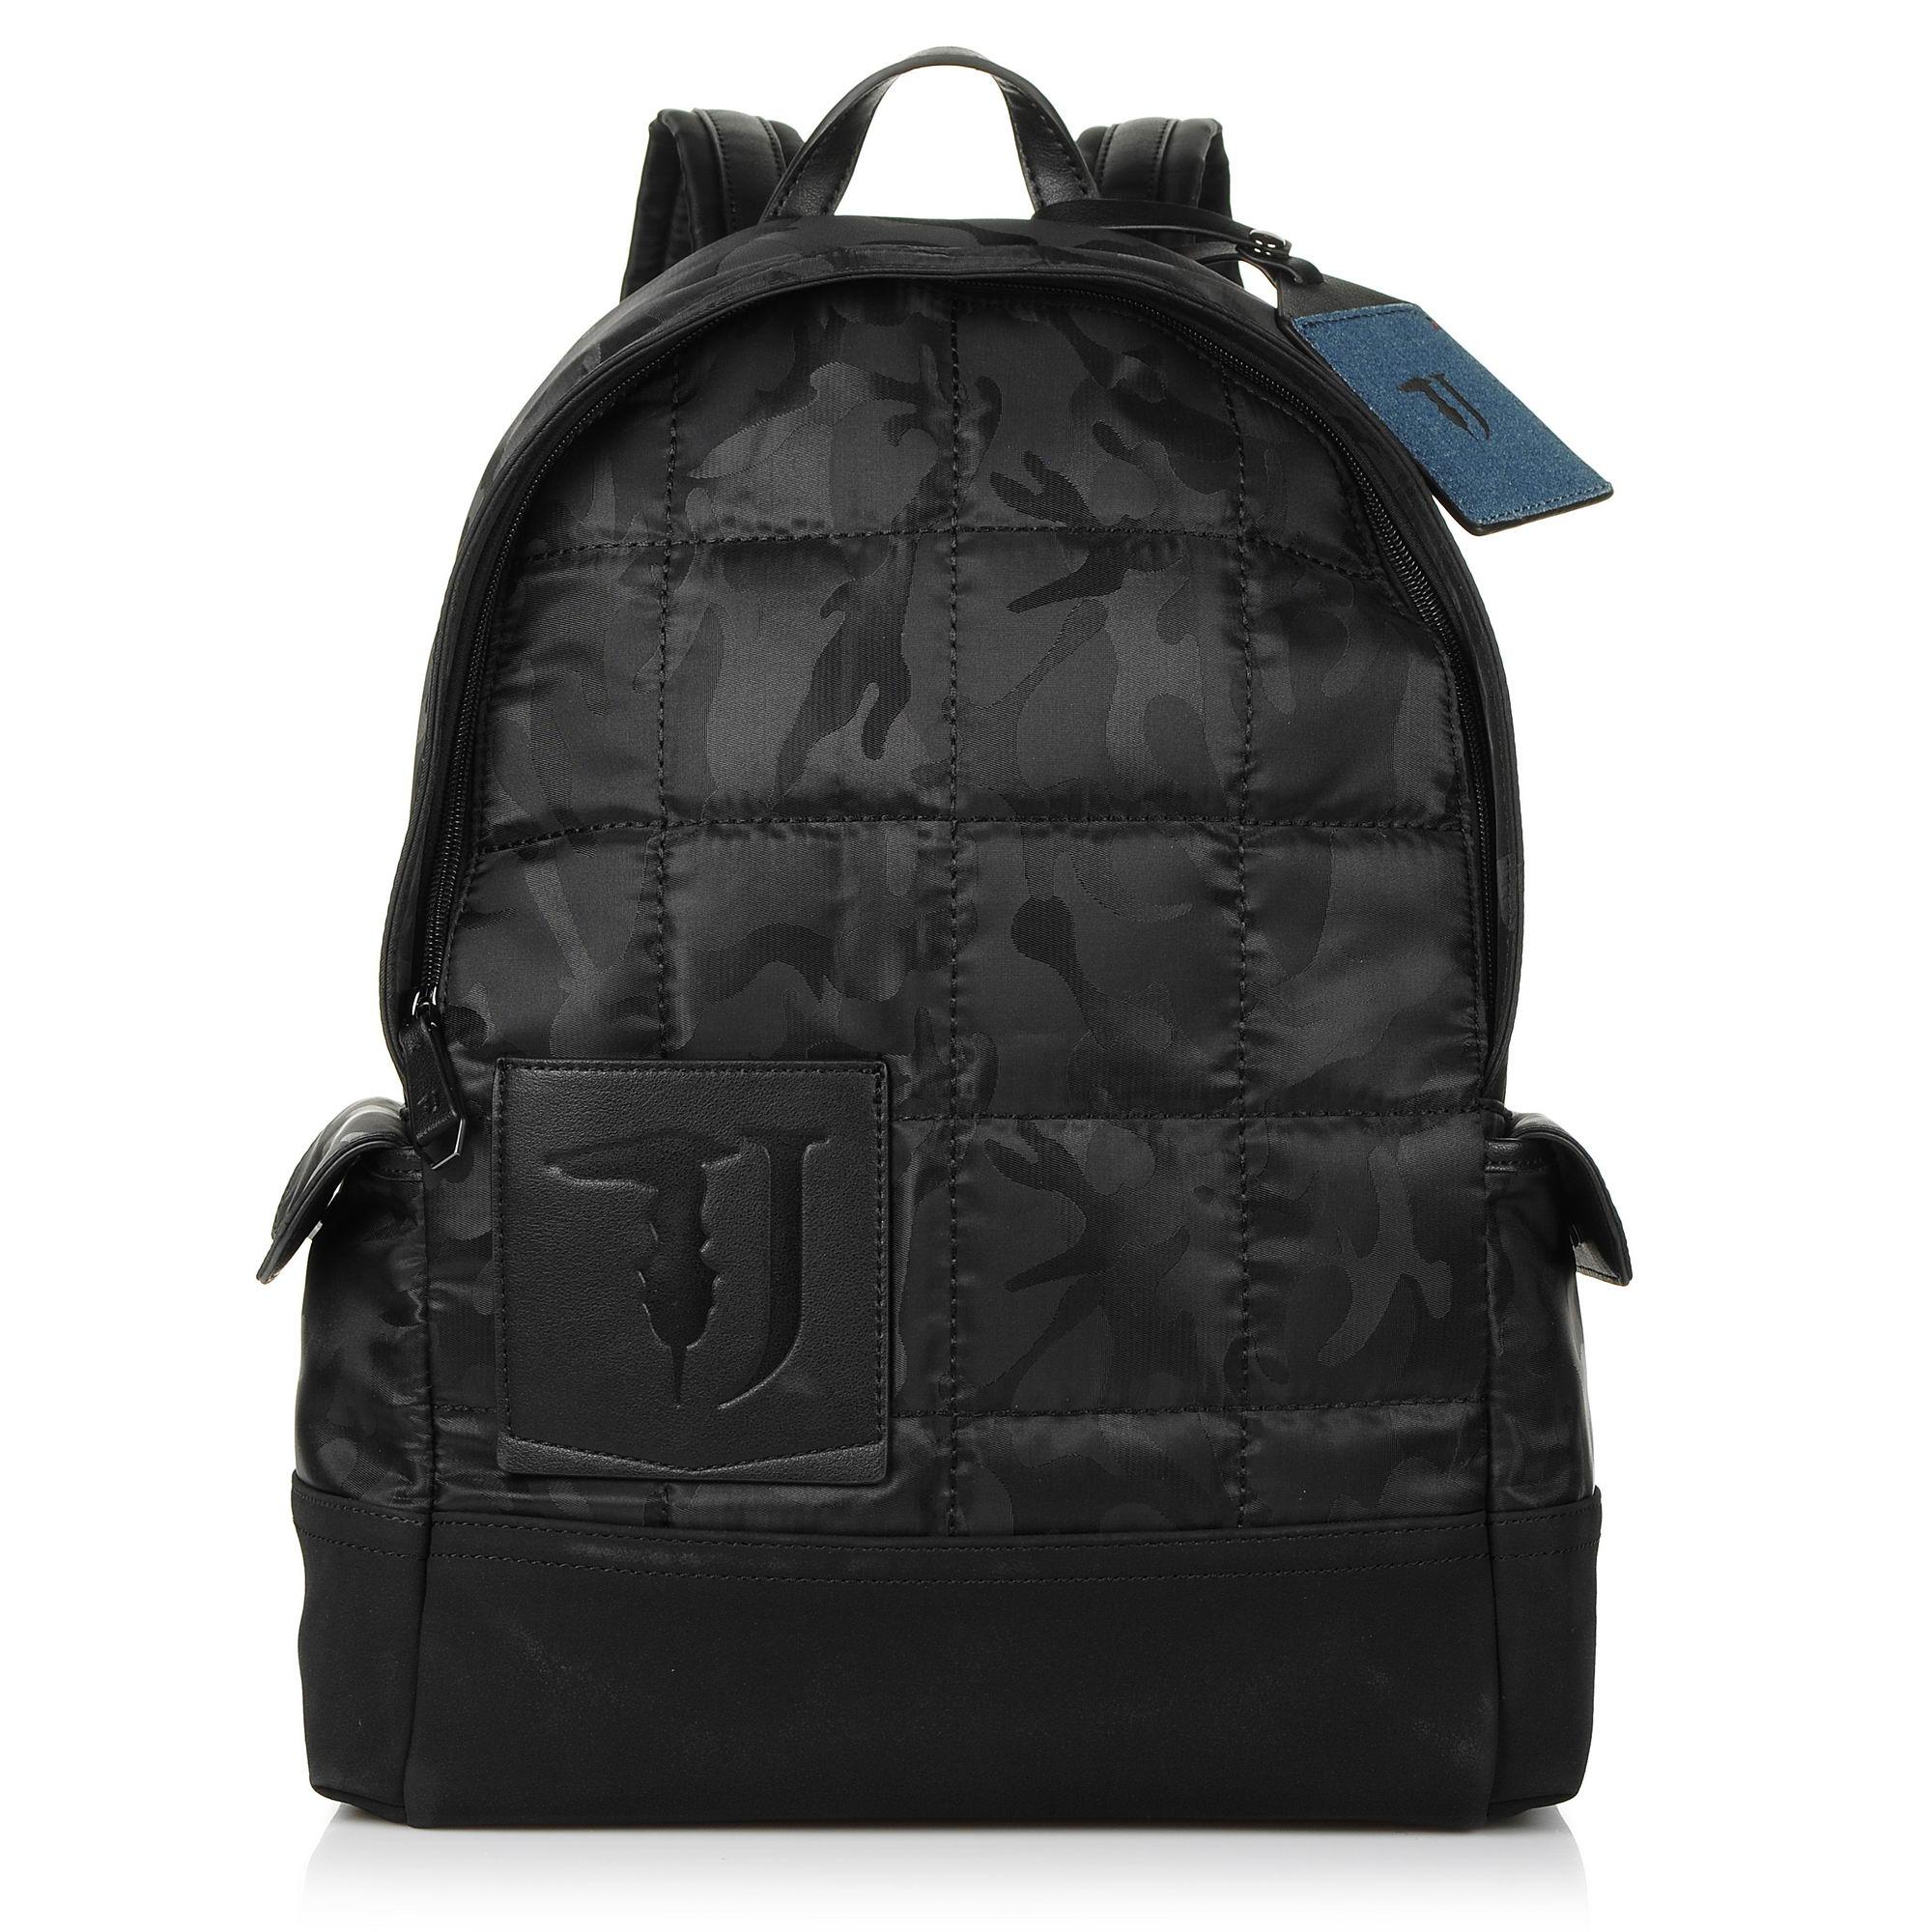 571b18541b Σακίδιο Πλάτης Trussardi Jeans Ticinese Backpack Nylon Camouflage ...